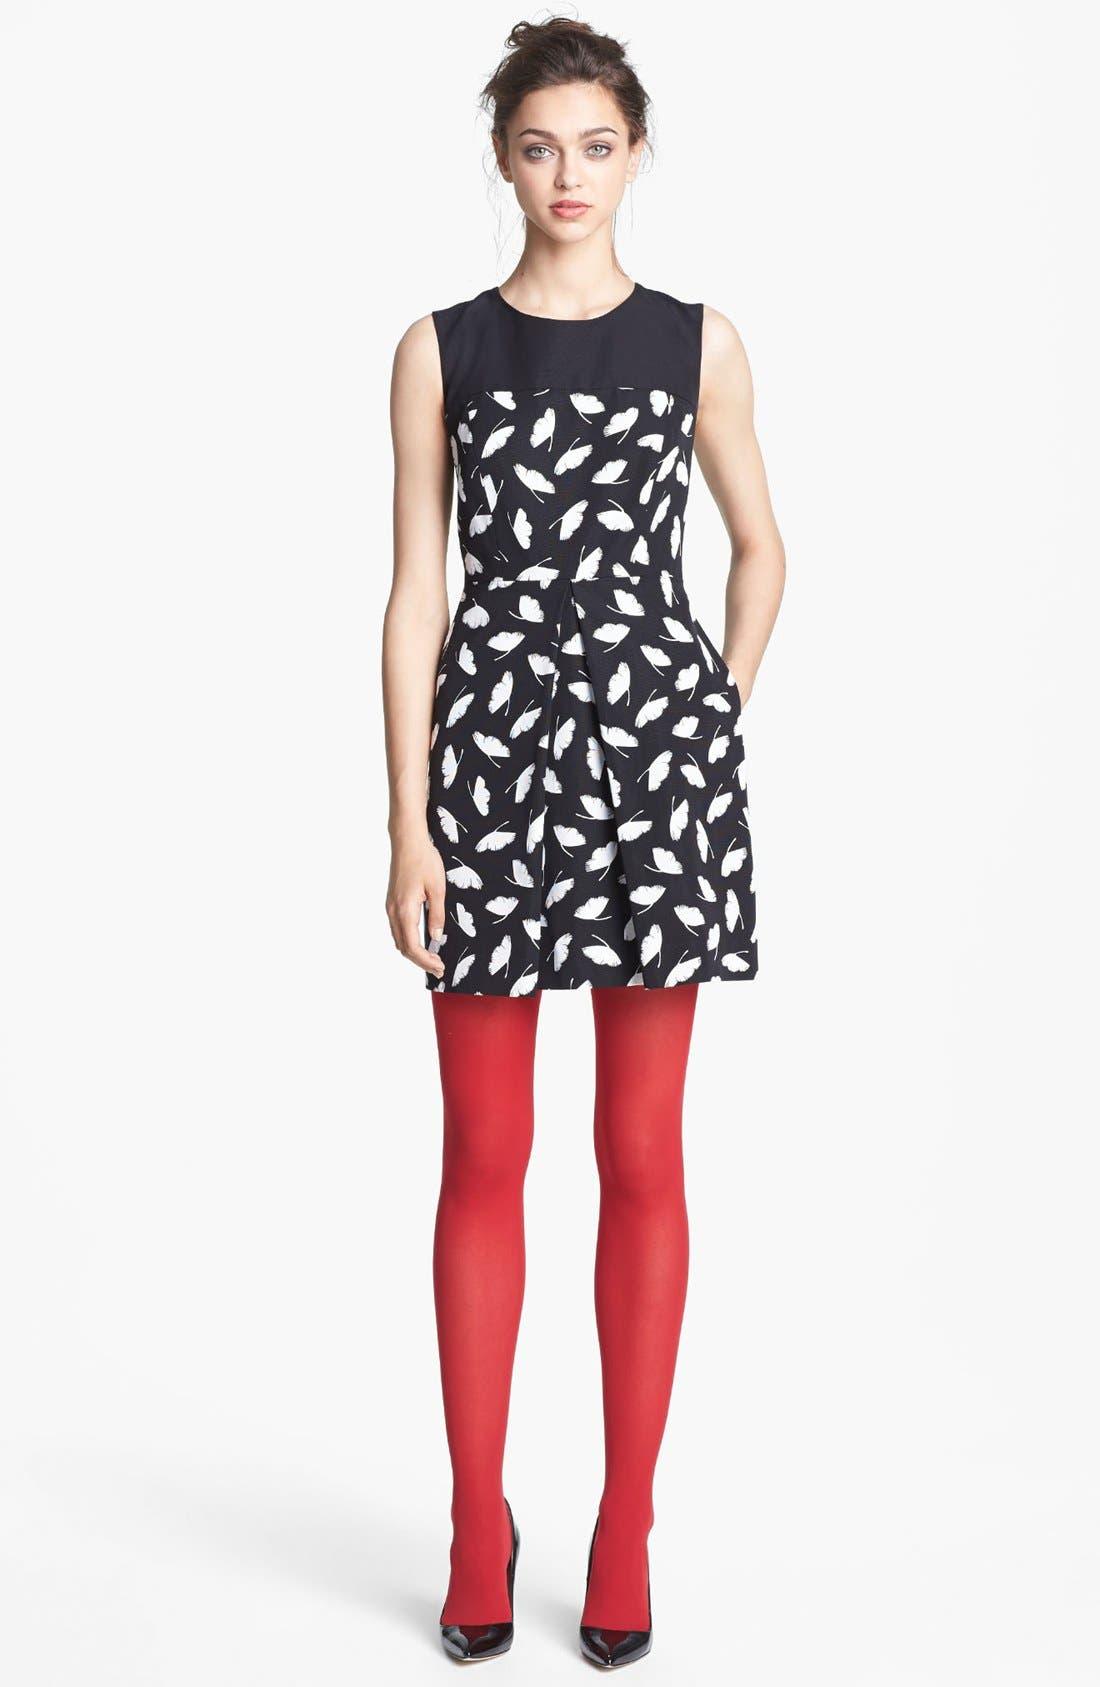 Alternate Image 1 Selected - Miss Wu 'Delicate Leaf' Print Dress (Nordstrom Exclusive)